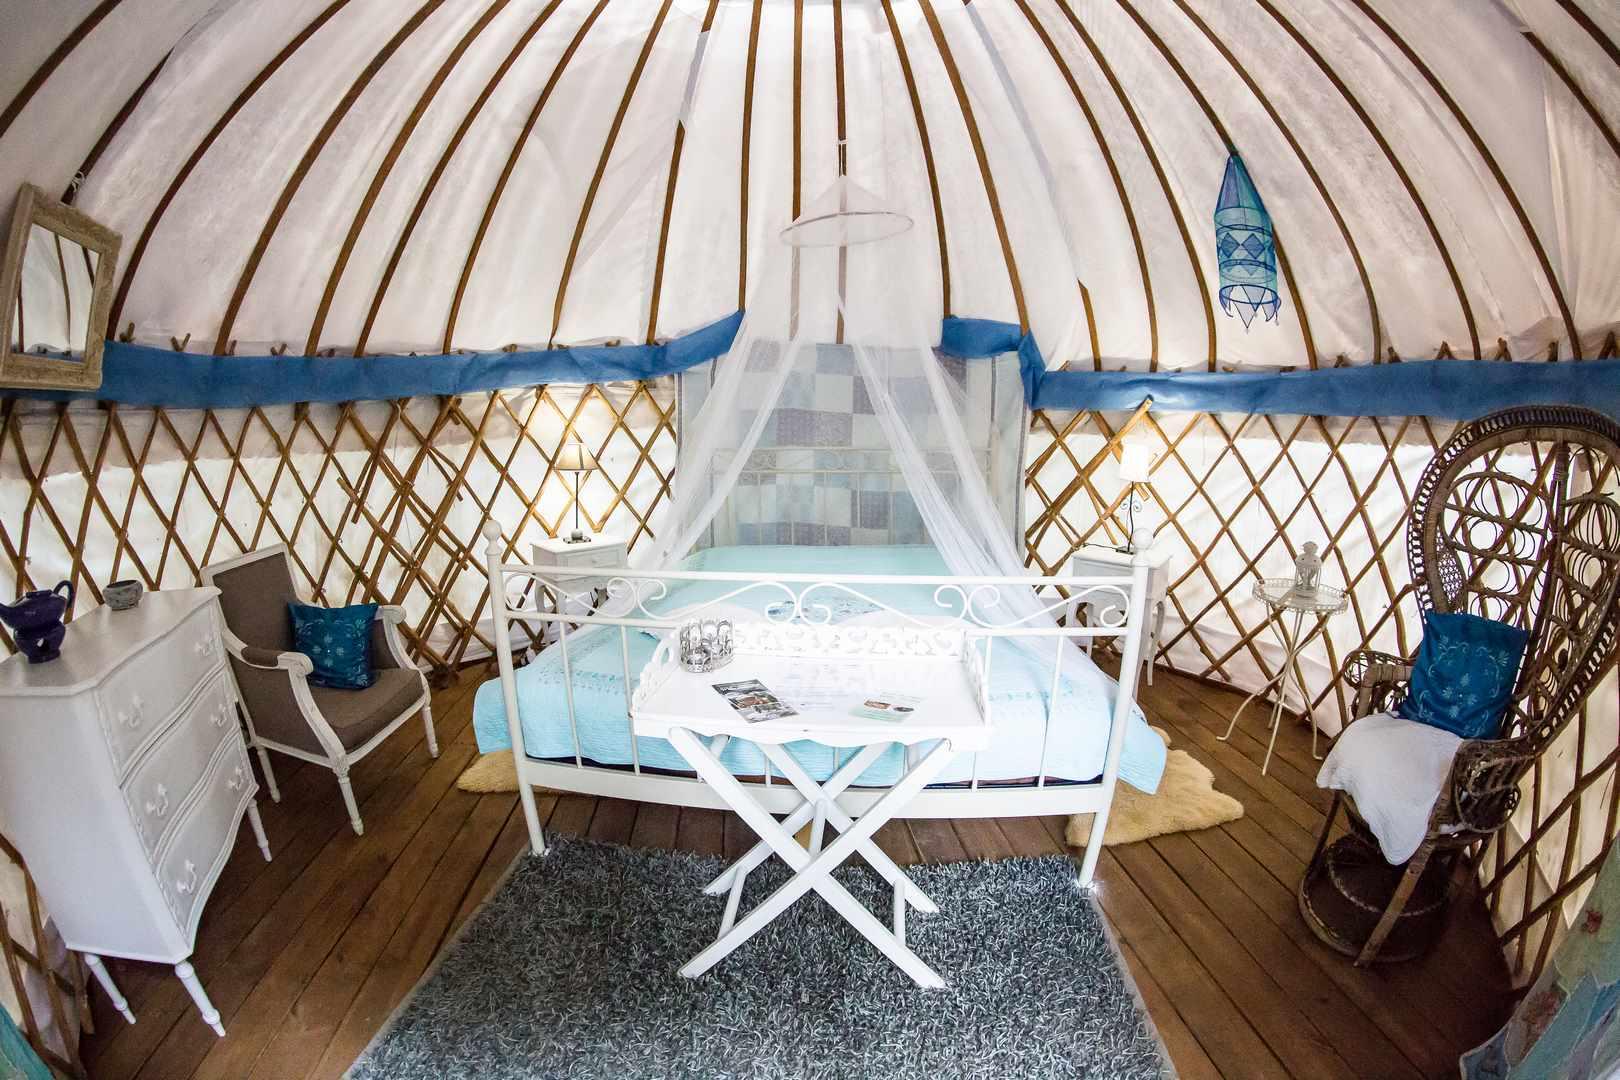 Romantic Yurt 8 at Mille Etoiles - Cool Camping (2435)